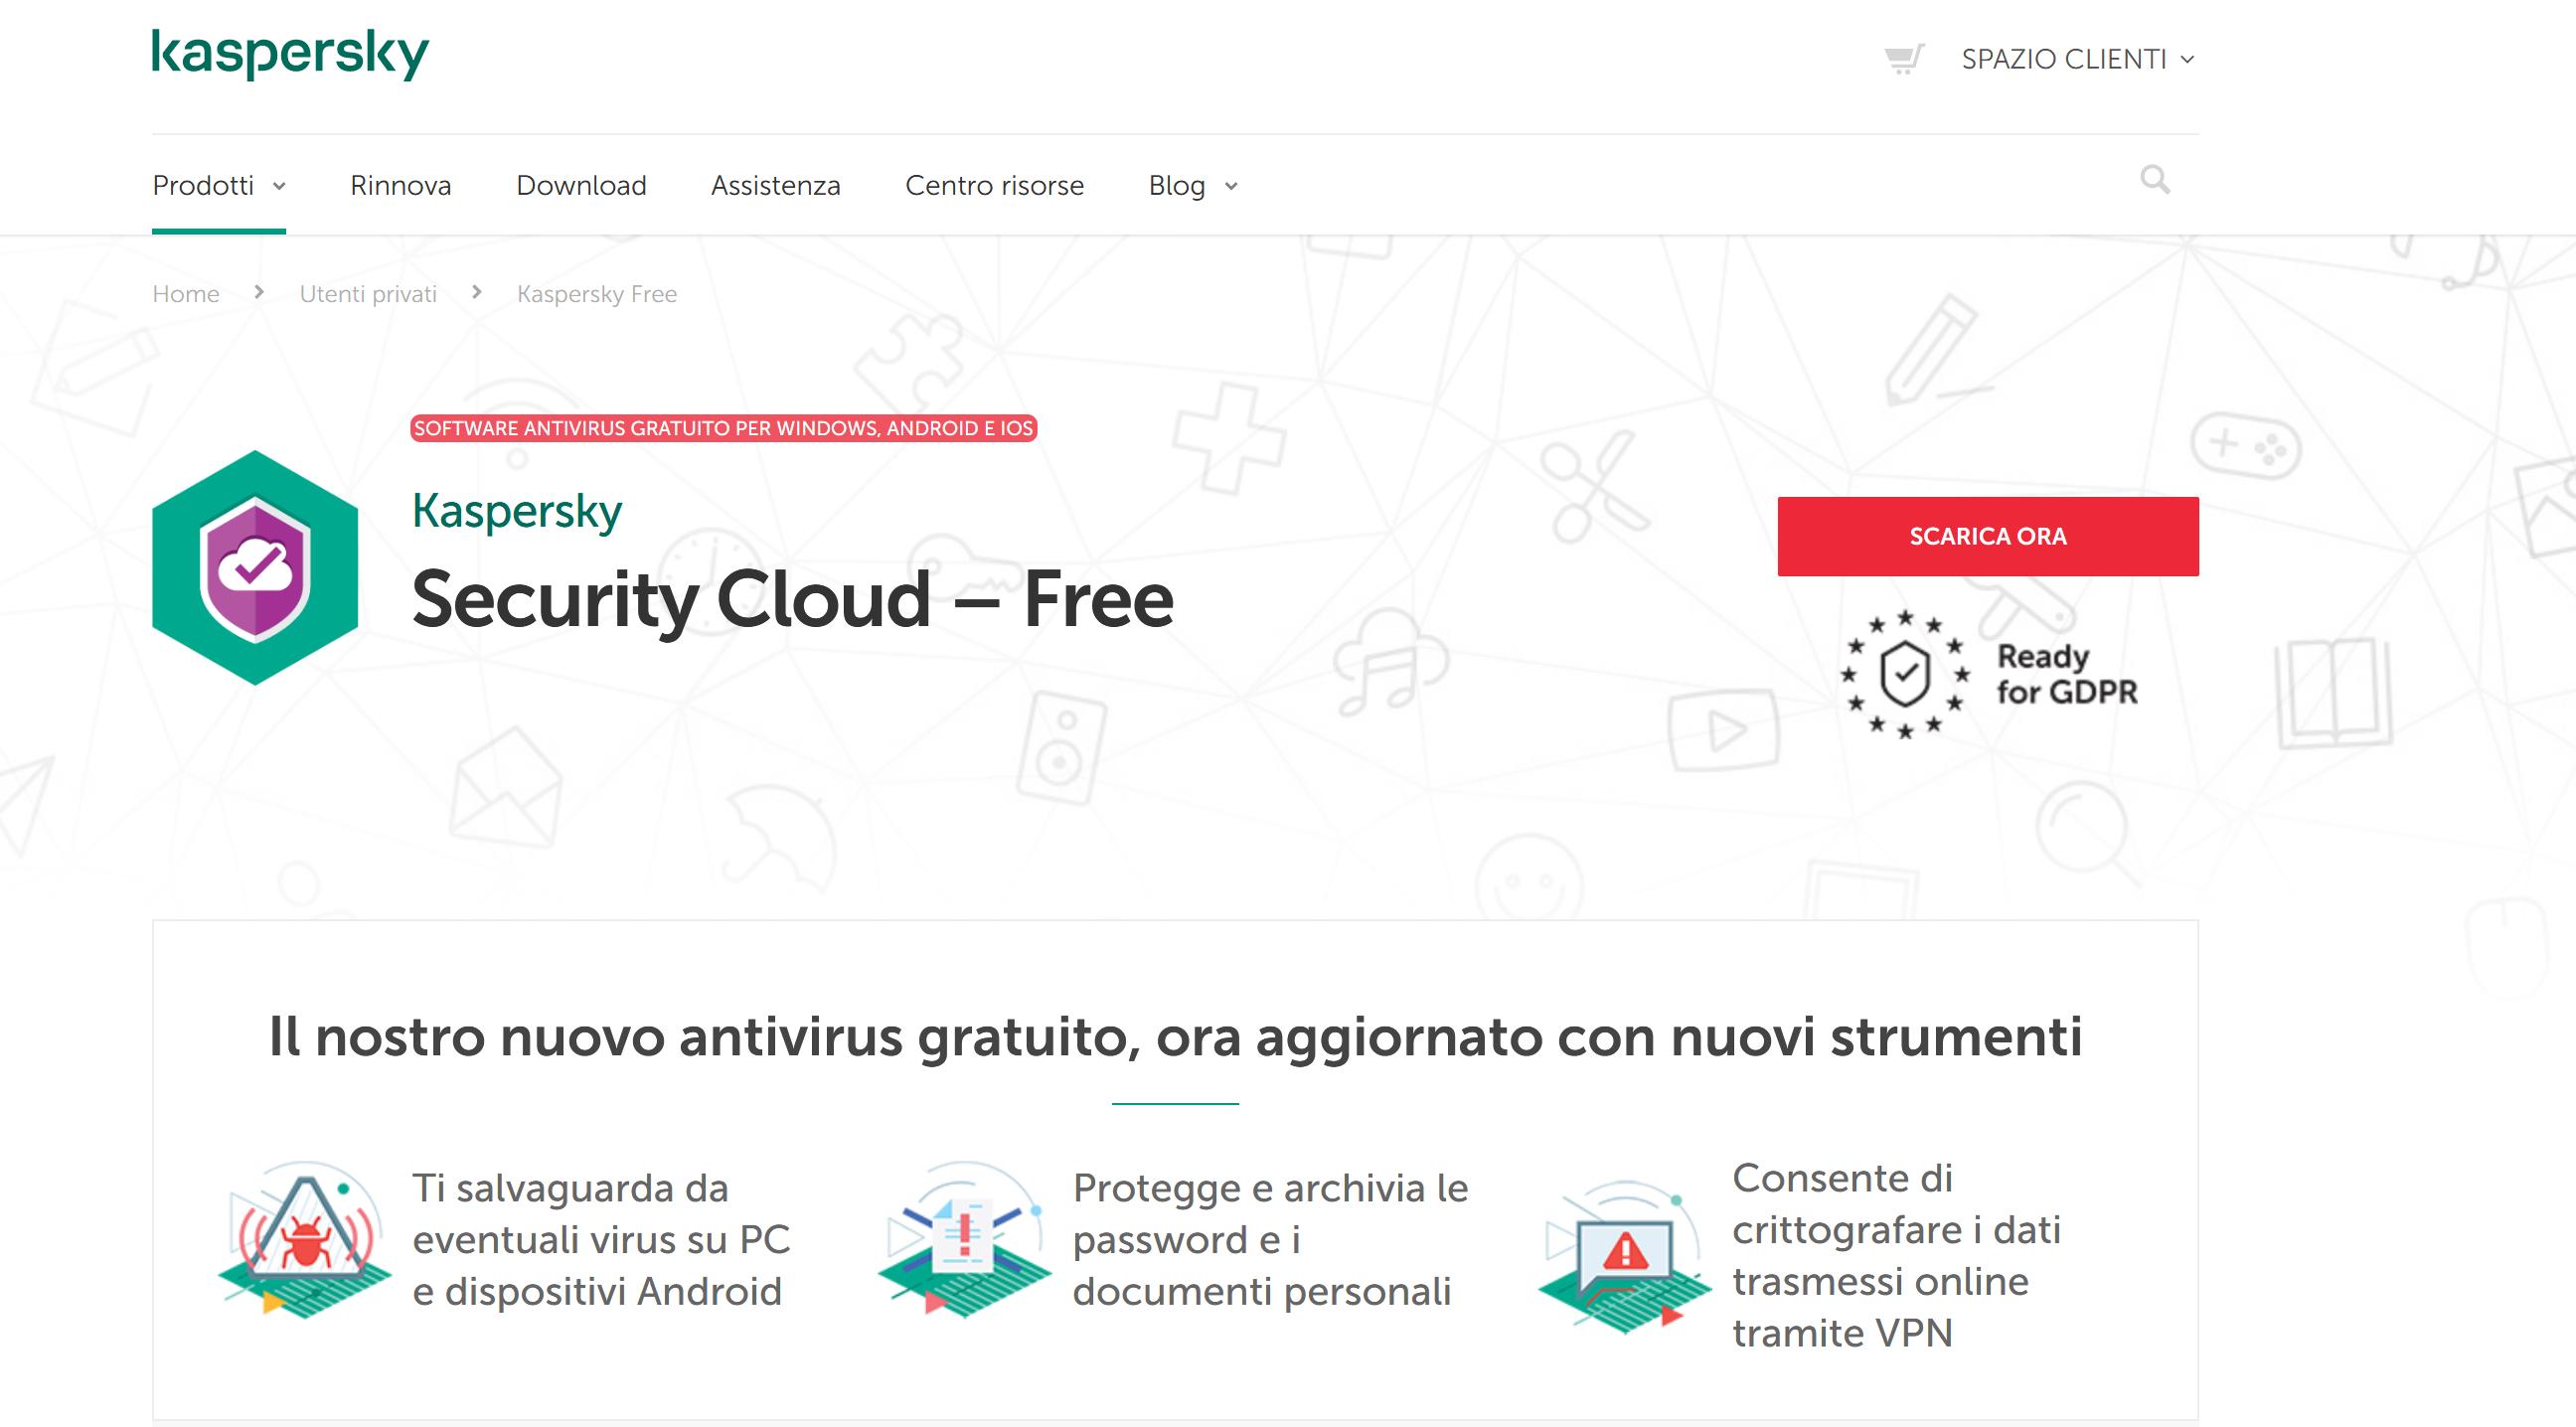 Il Miglior Antivirus Gratis Del 2020: 6 Software Per La Sicurezza Online - Kaspersky security cloud free